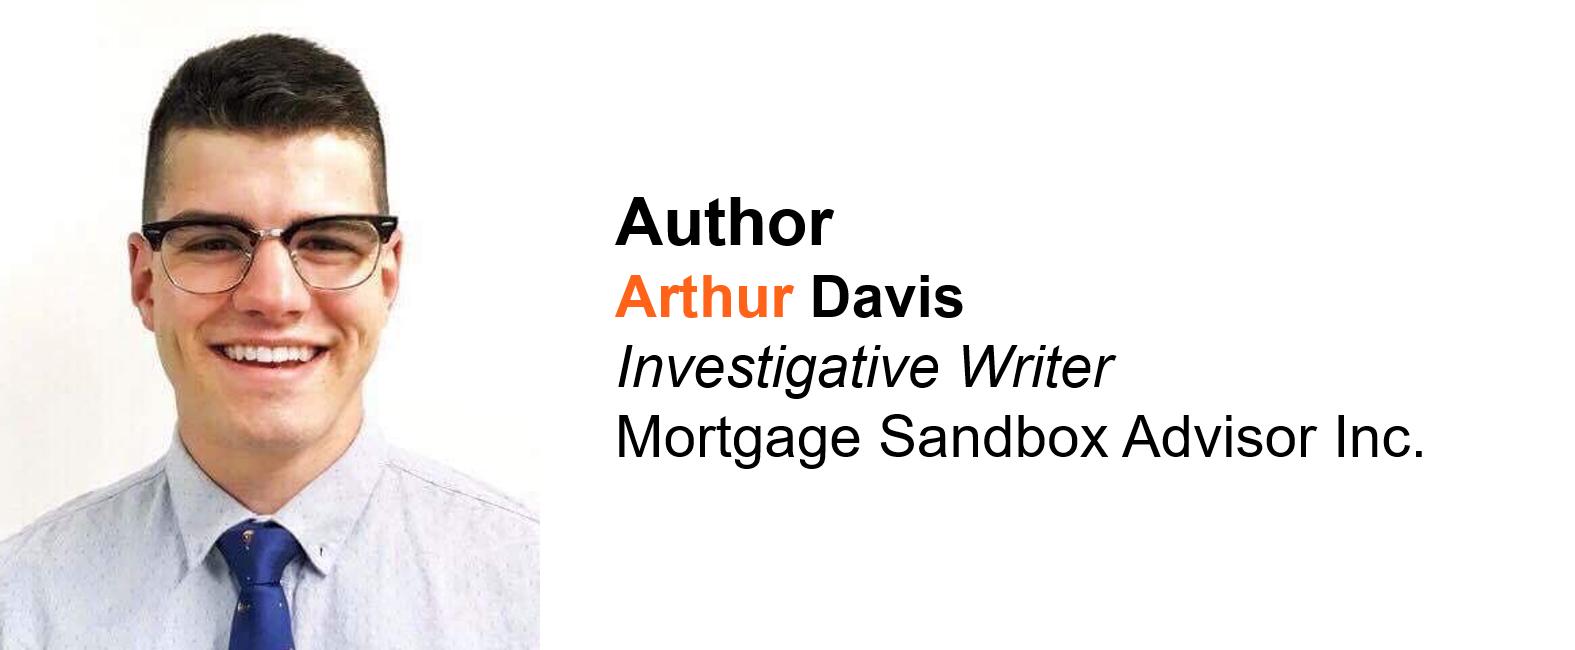 00 Blog Signature (Arthur).png